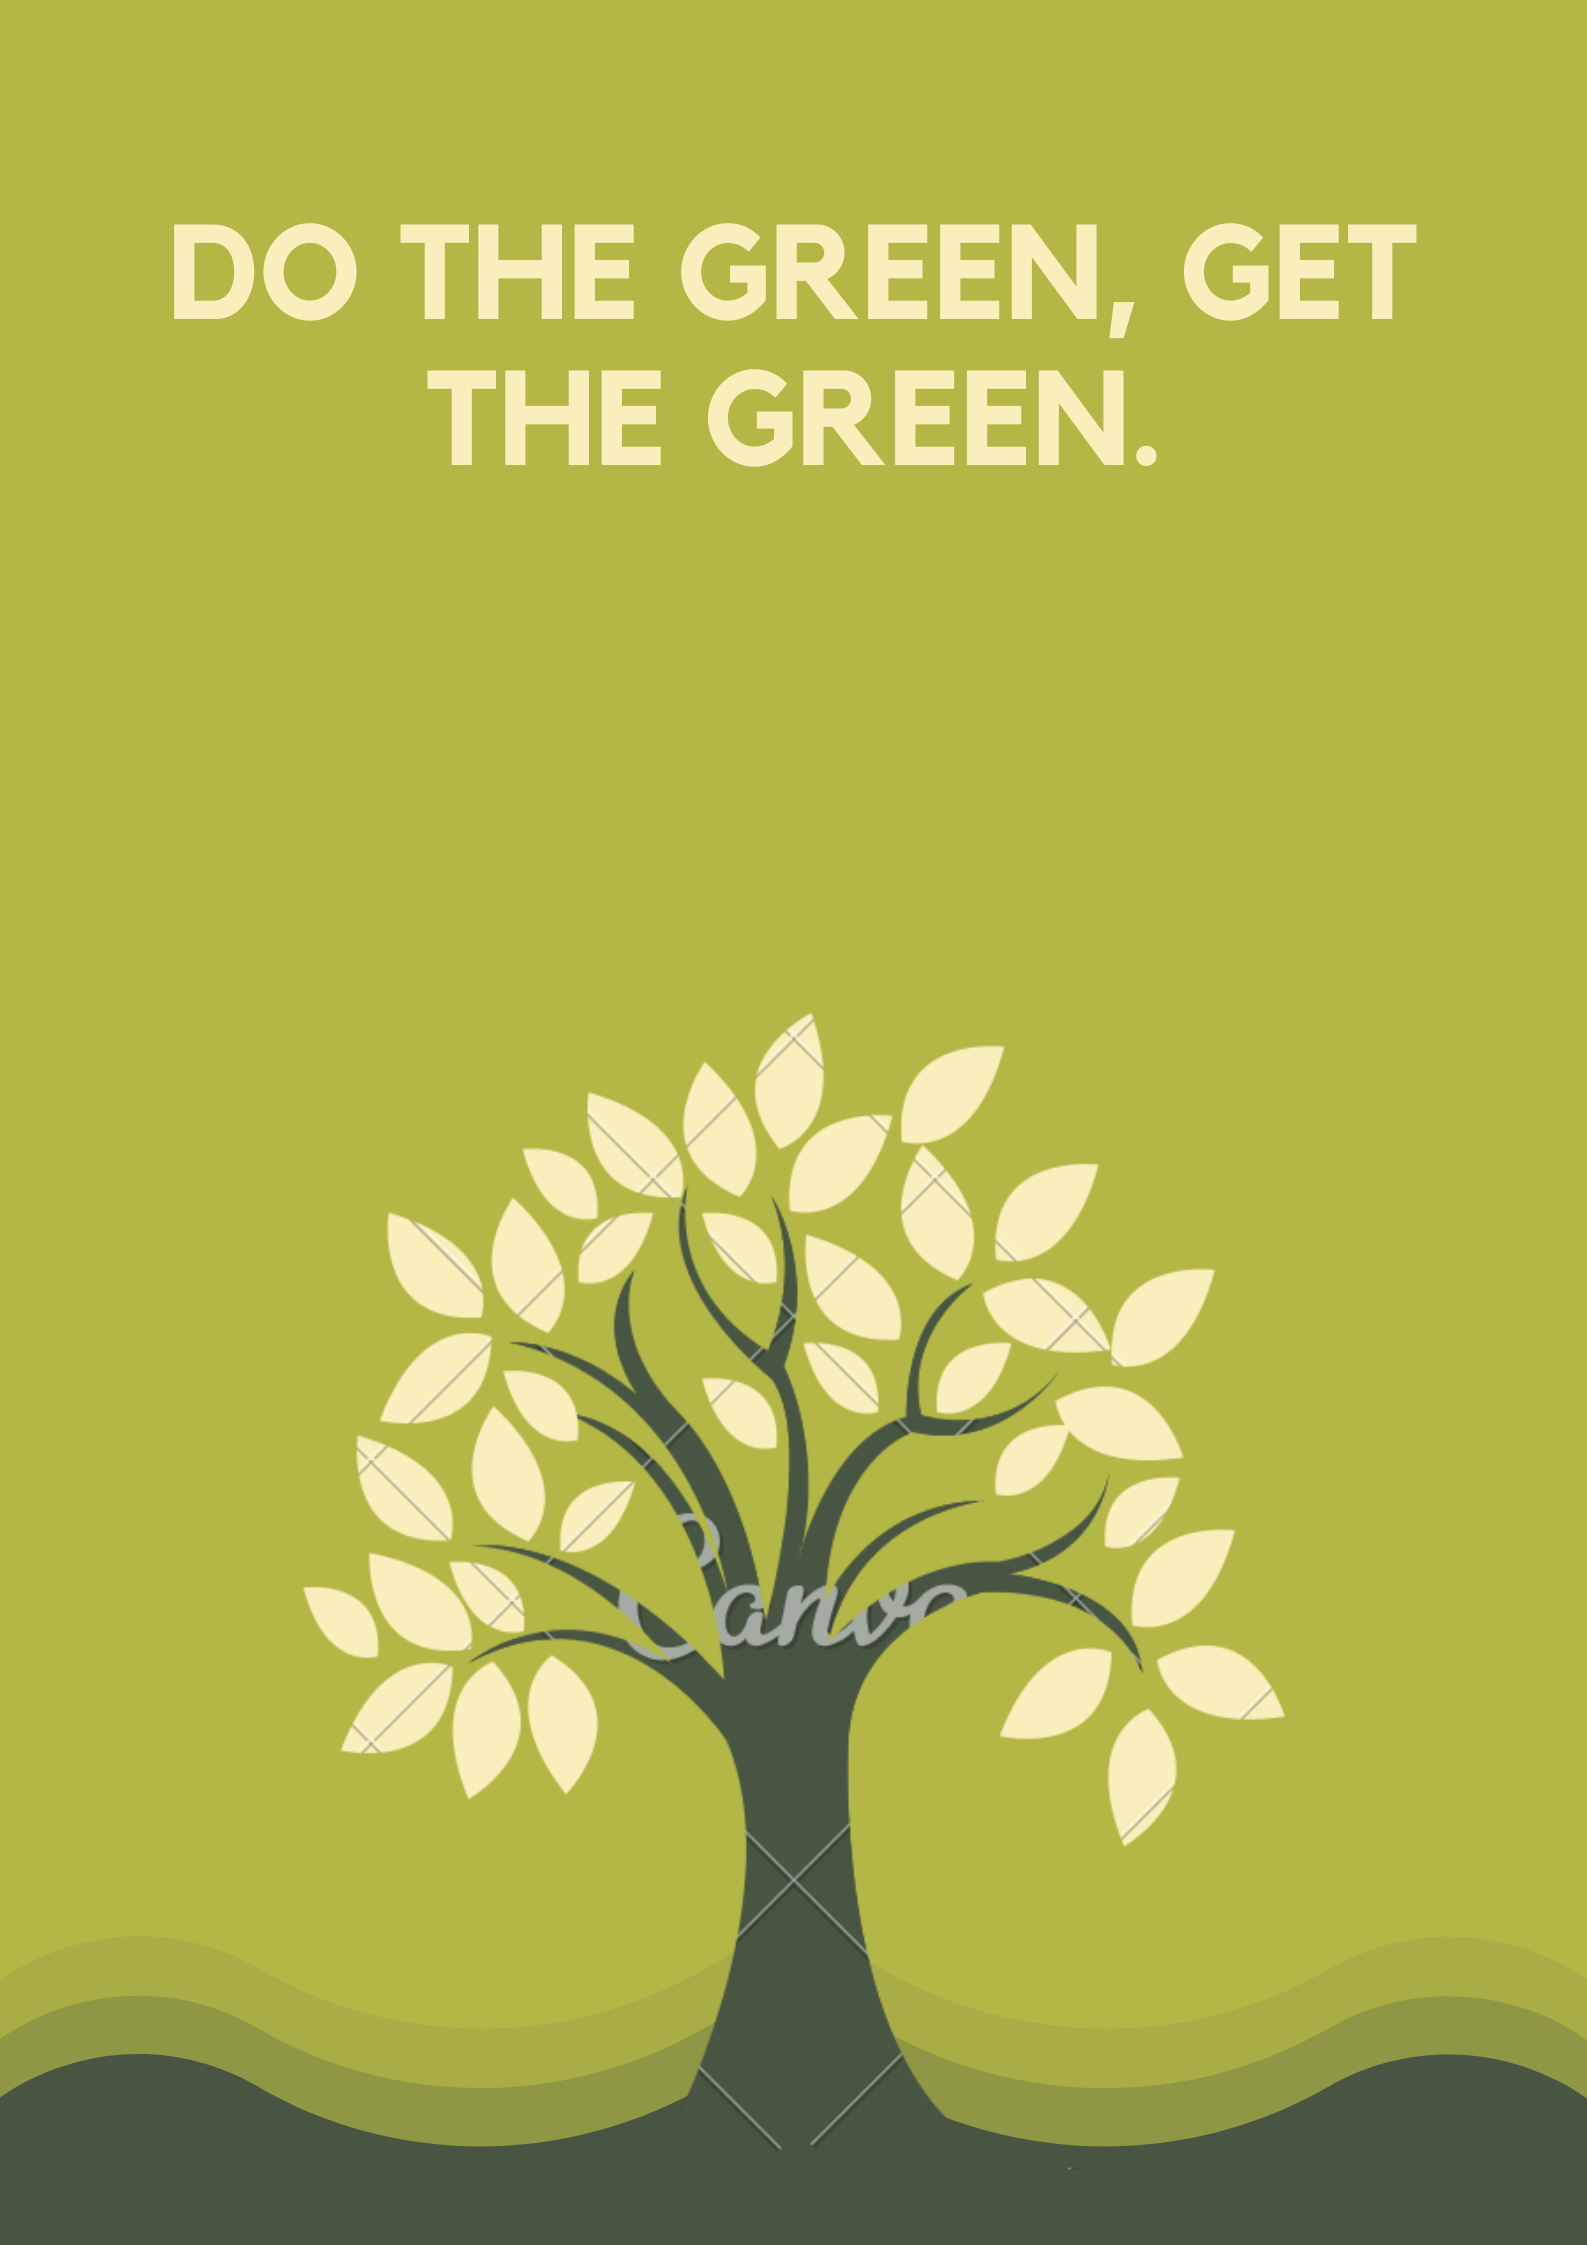 Best environmental slogans